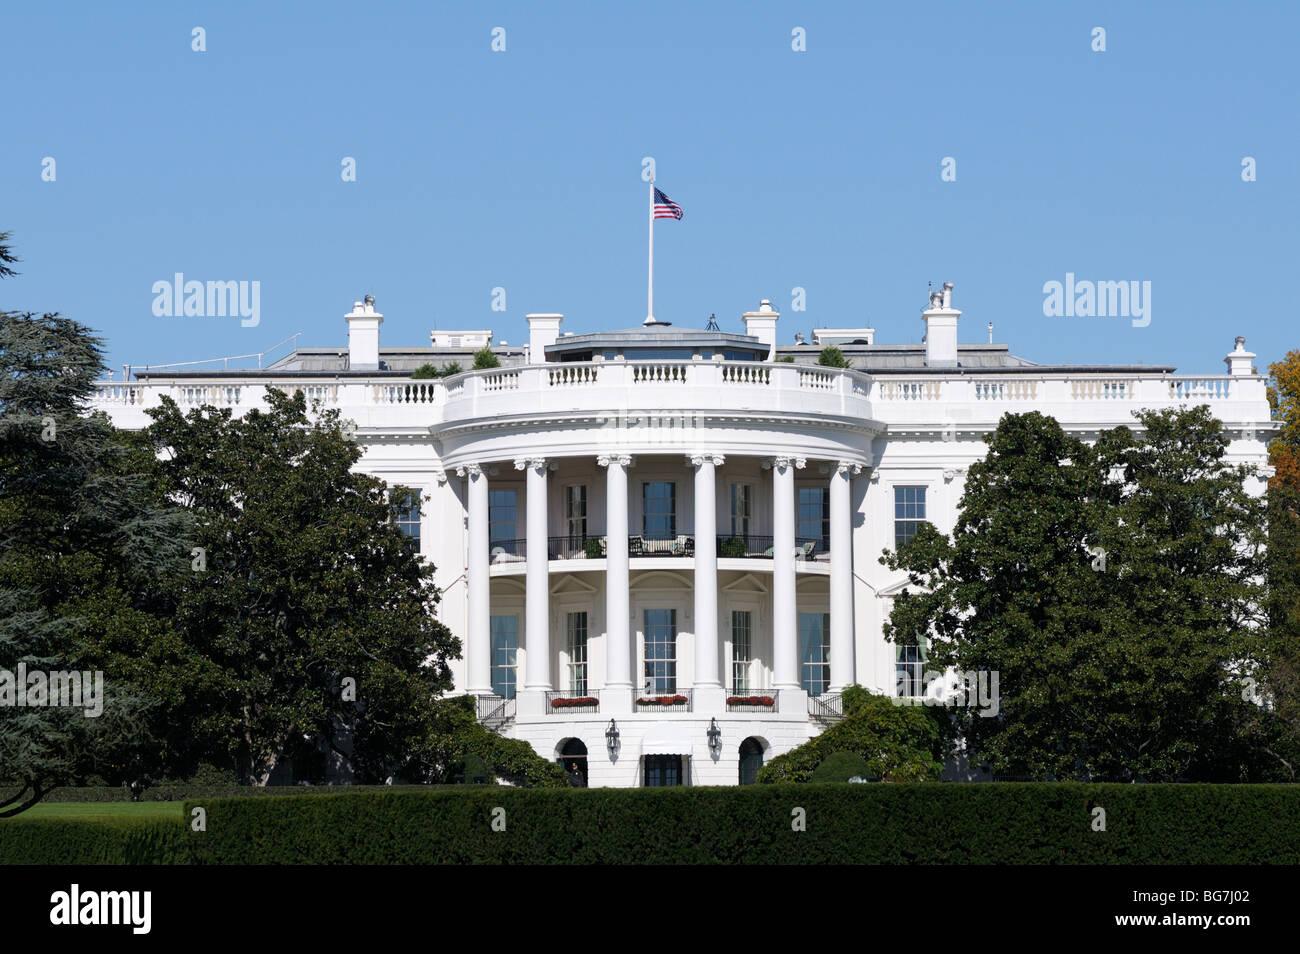 The White House south facade - Stock Image